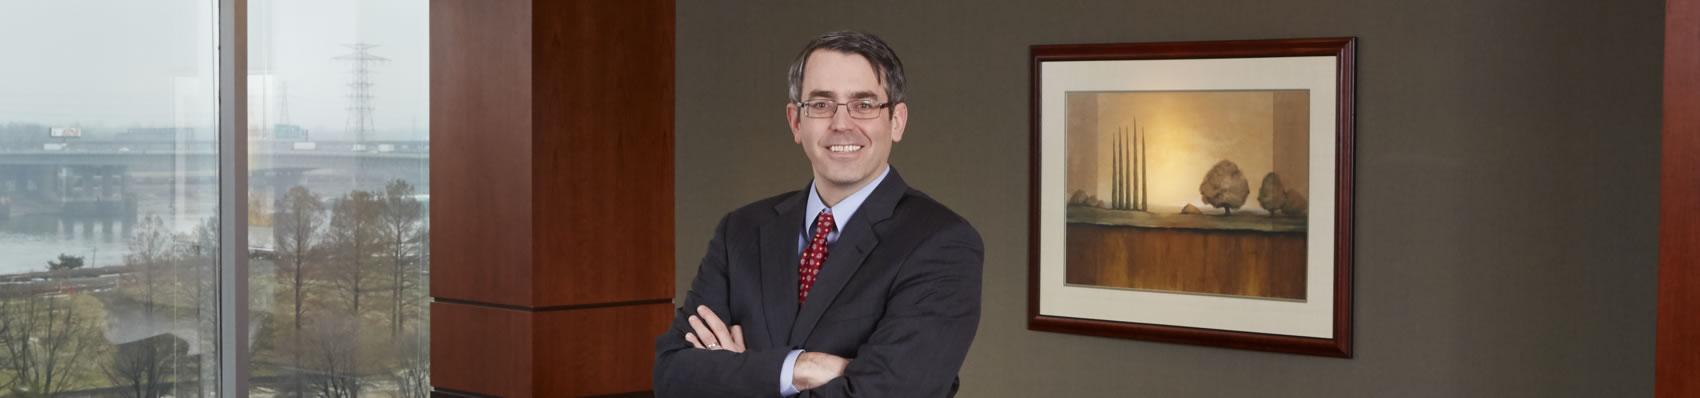 Mike Hamlin, Principal at Pitzer Snodgrass, P.C.